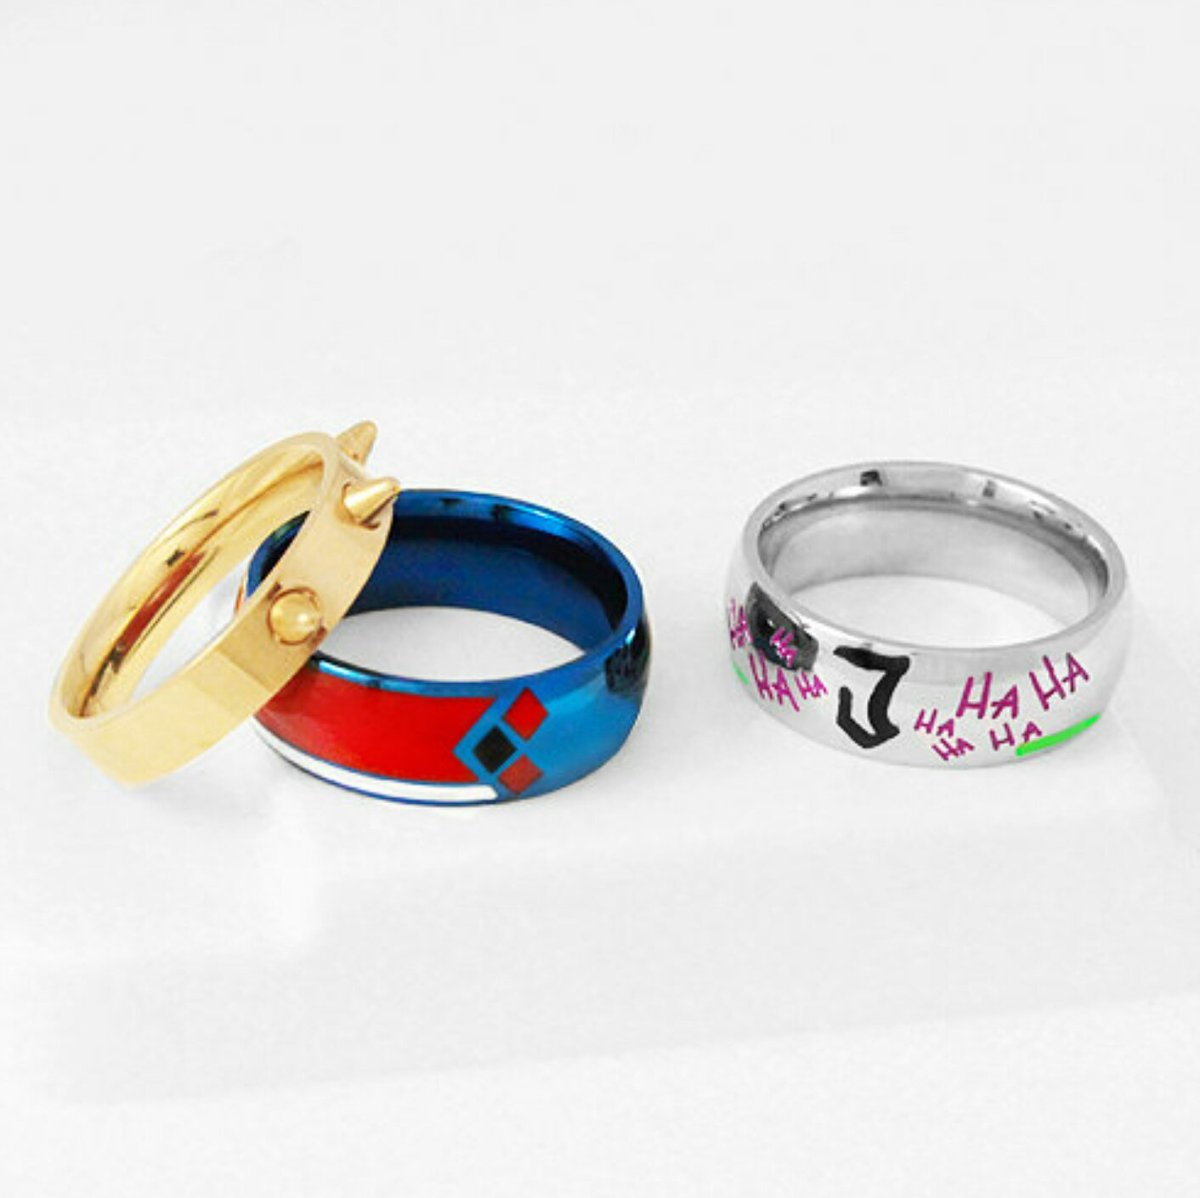 These Harley Quinn & Joker Couple Rings Tho :o Love The Harley Quinn's Set  Especially